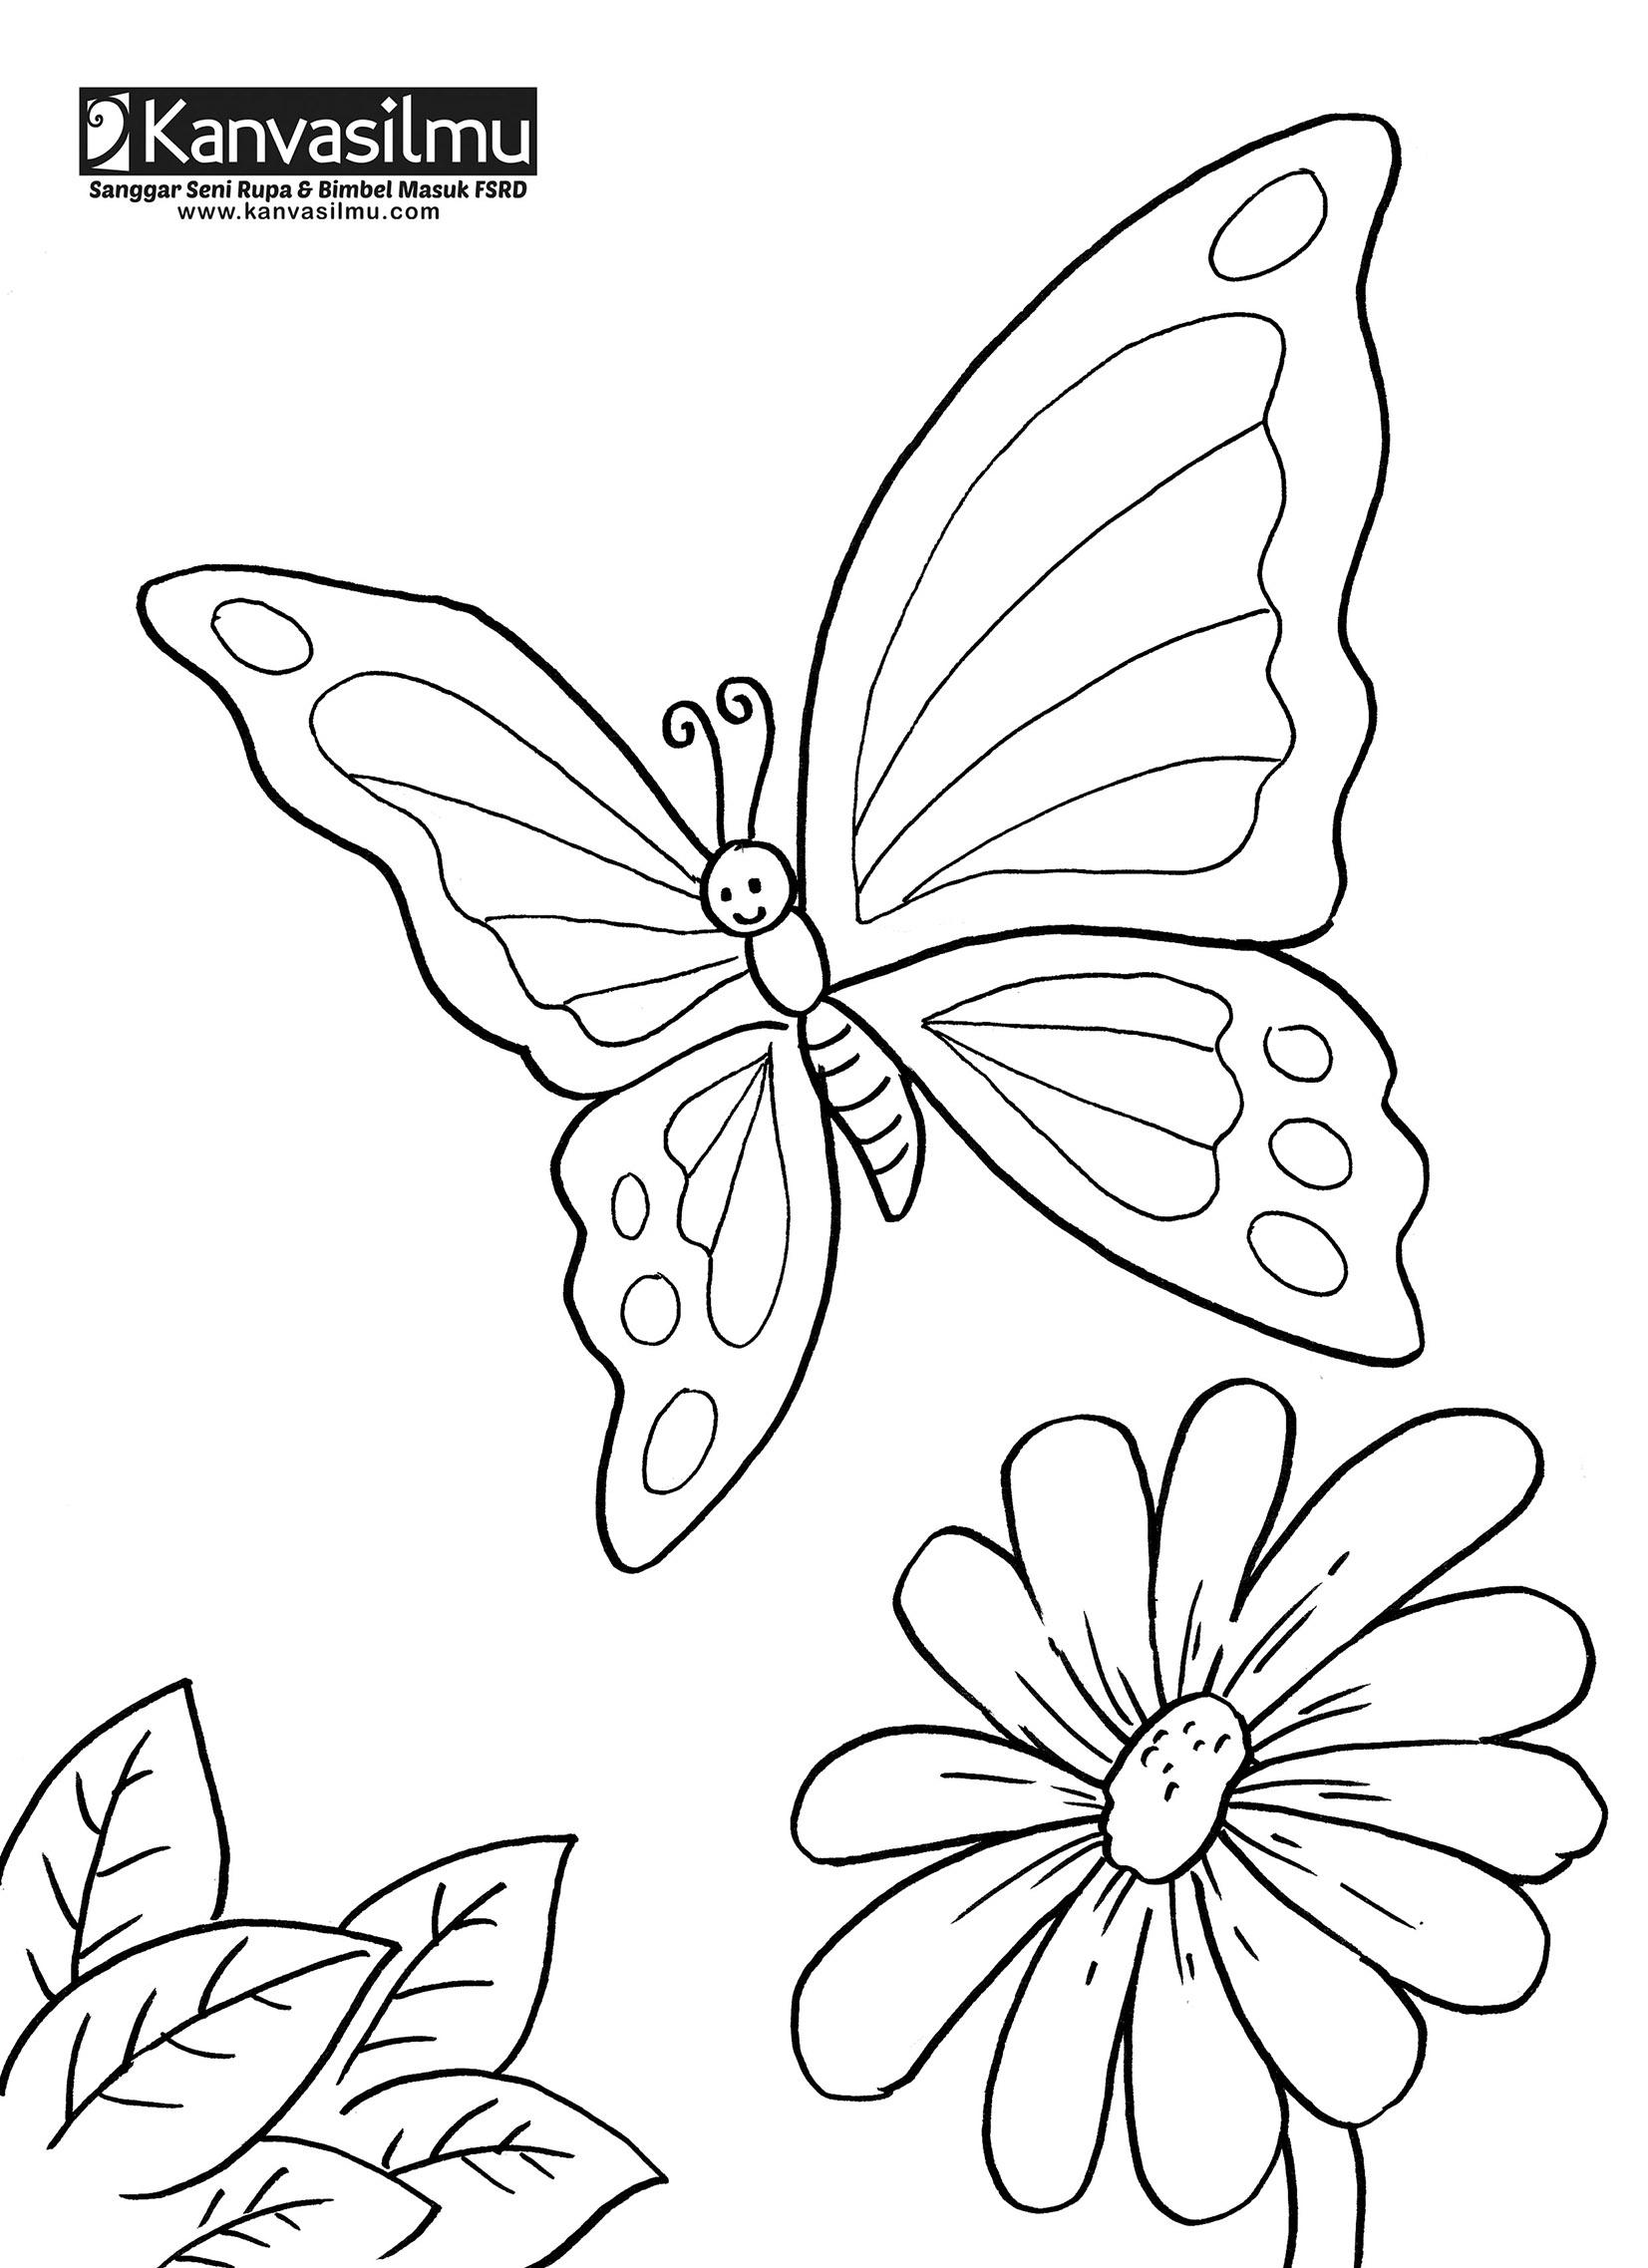 Lembar Mewarnai Bunga & Kupu Kupu Kanvasilmu